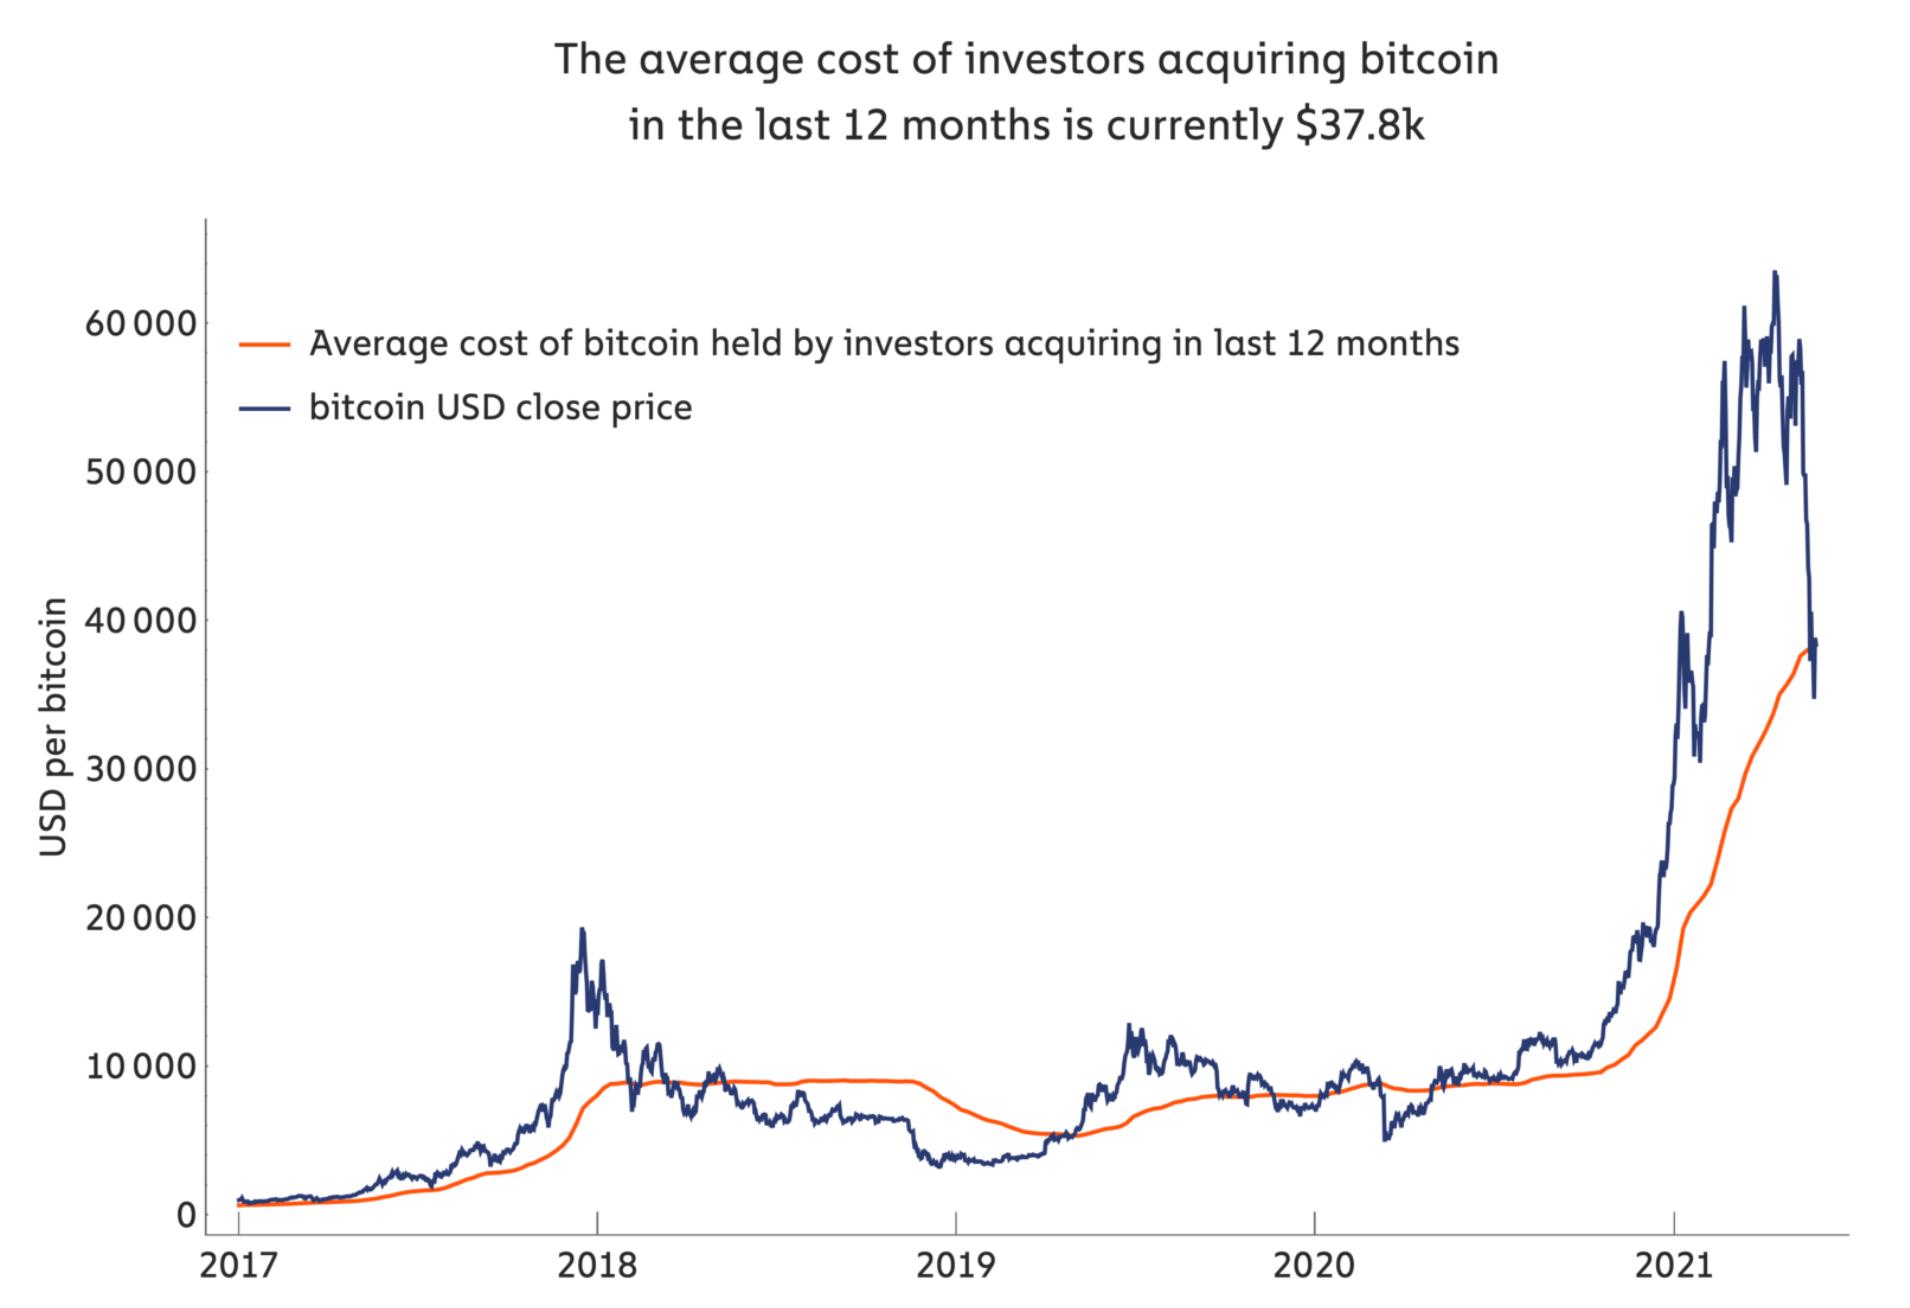 bitcoin-usd-chainalysis-average-cost